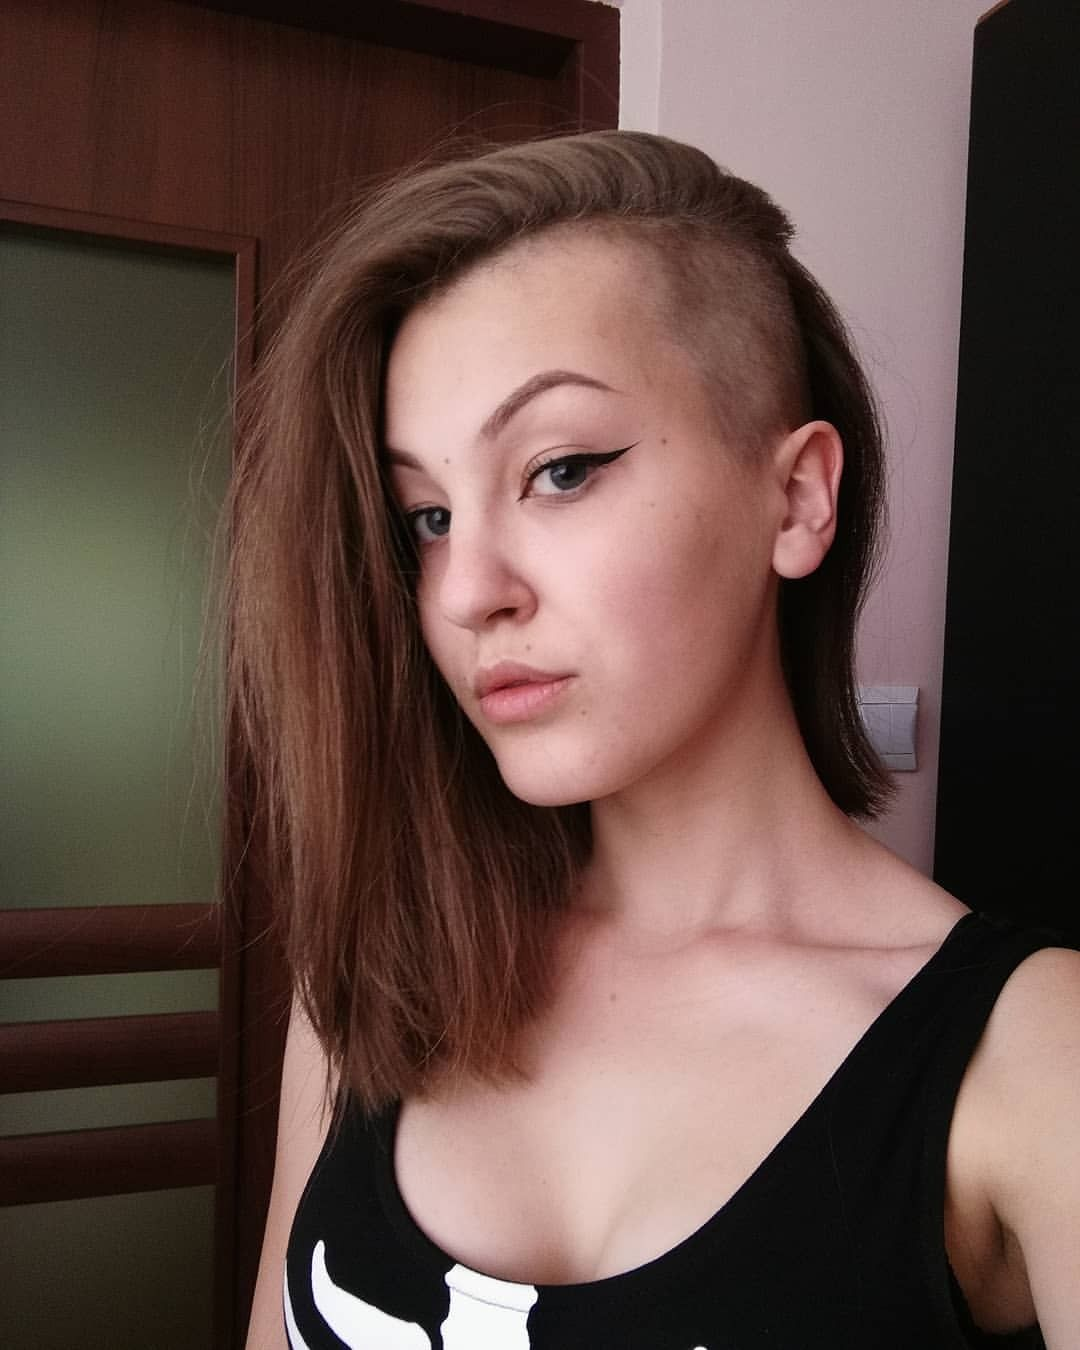 pussy-girl-girl-hair-hair-long-shaved-short-their-girls-fucking-pic